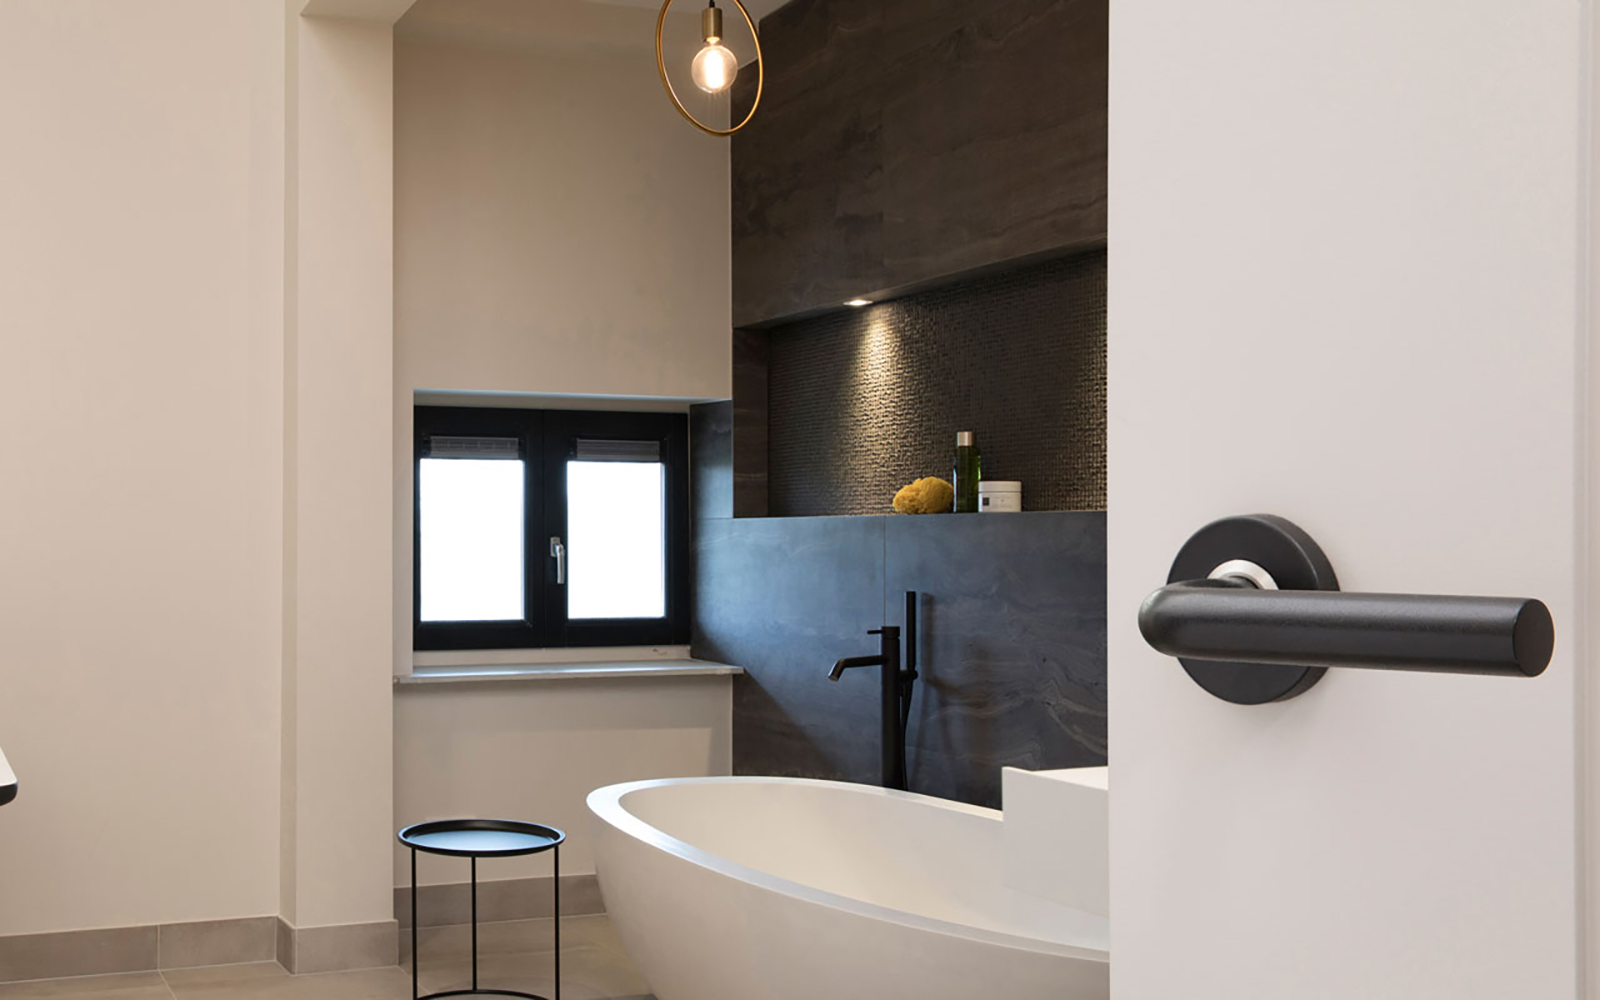 Design deurbeslag, Intersteel, klassevol